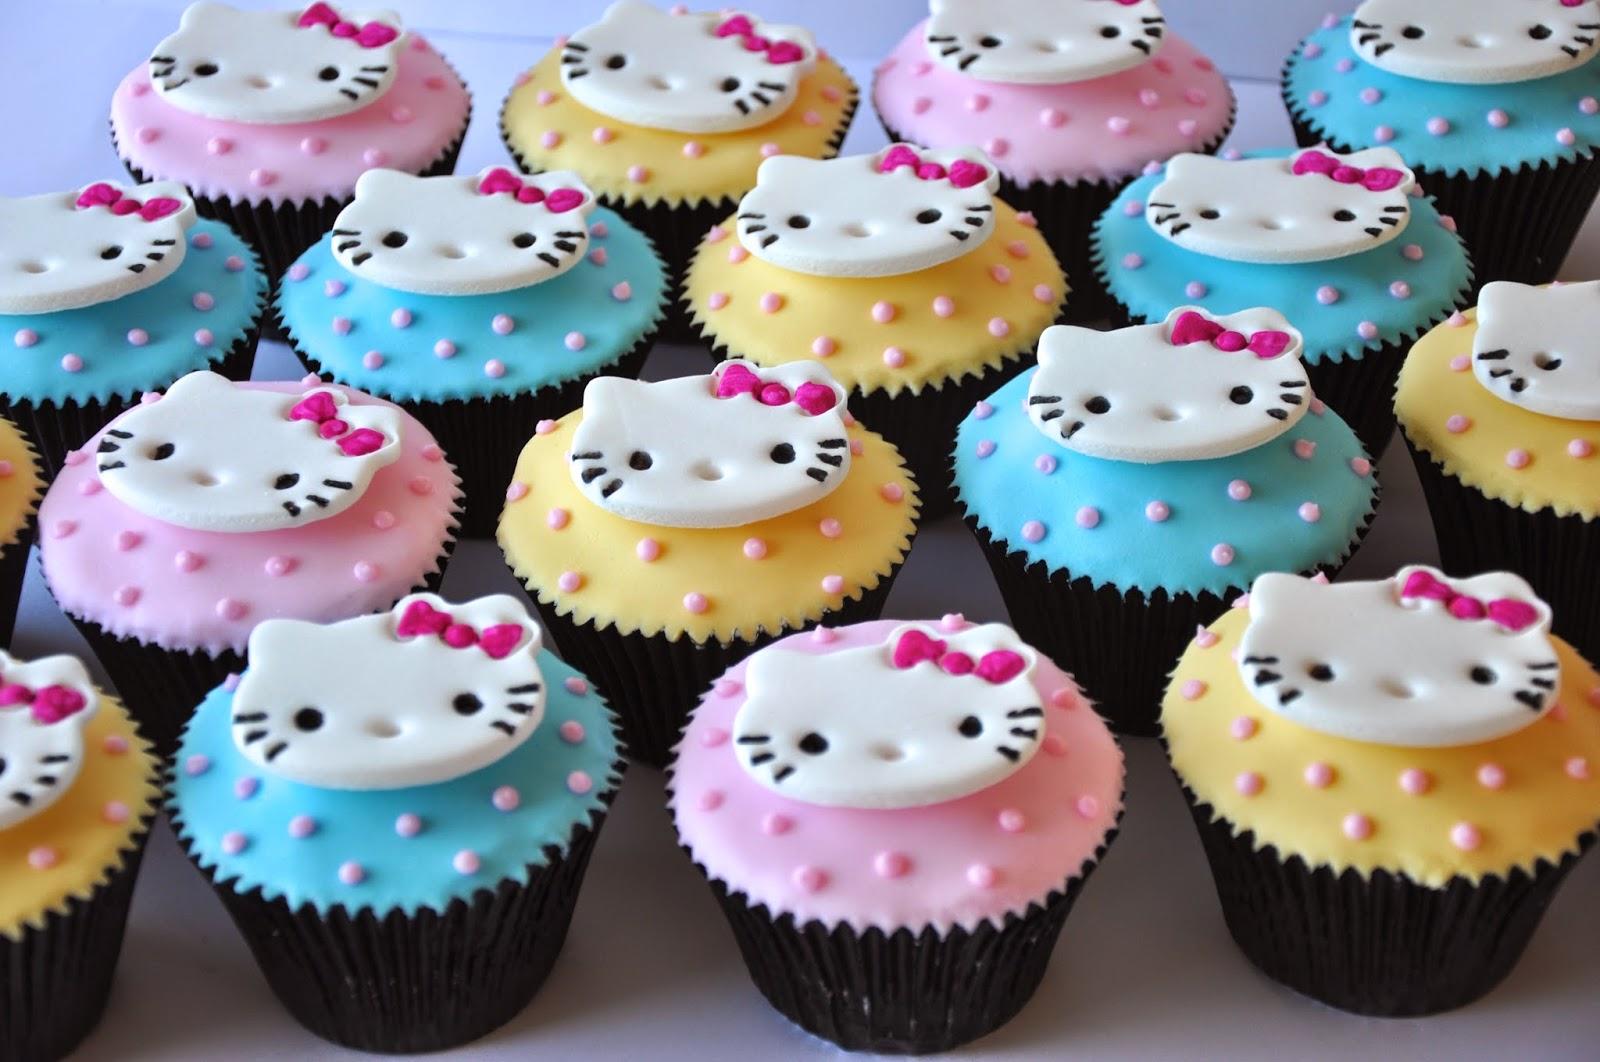 Rozanne S Cakes Hello Kitty Cupcakes Cakes Durbanville